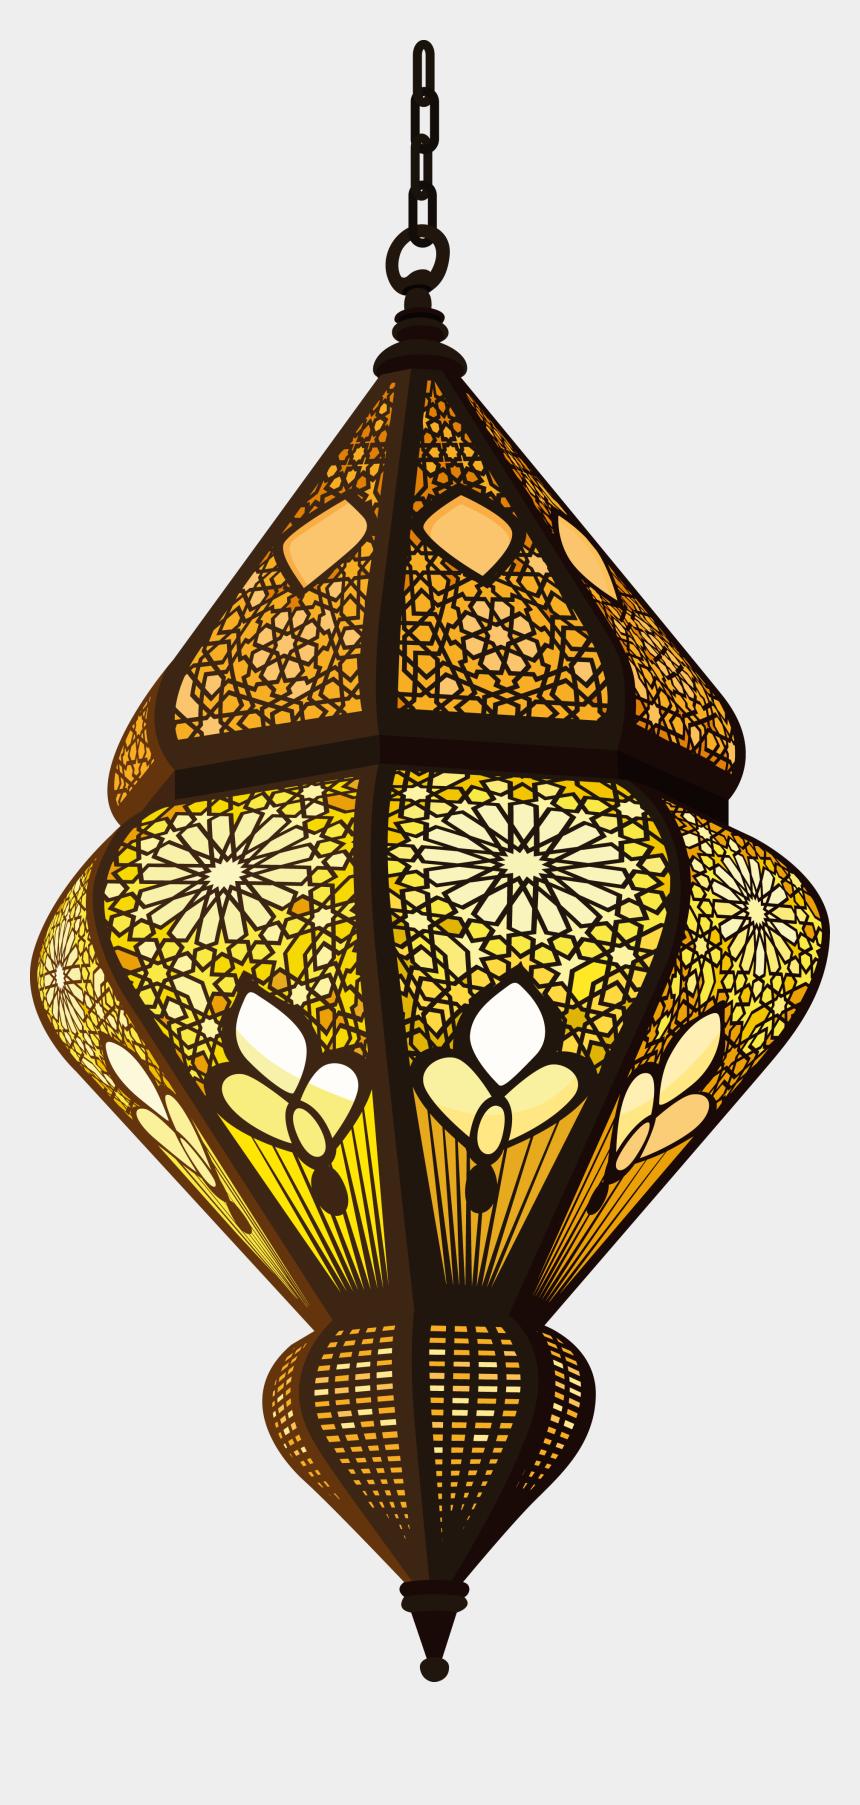 quran clipart, Cartoons - Decorative Muslim Quran Allah Sufism Lamp Islam Clipart - Islam Png